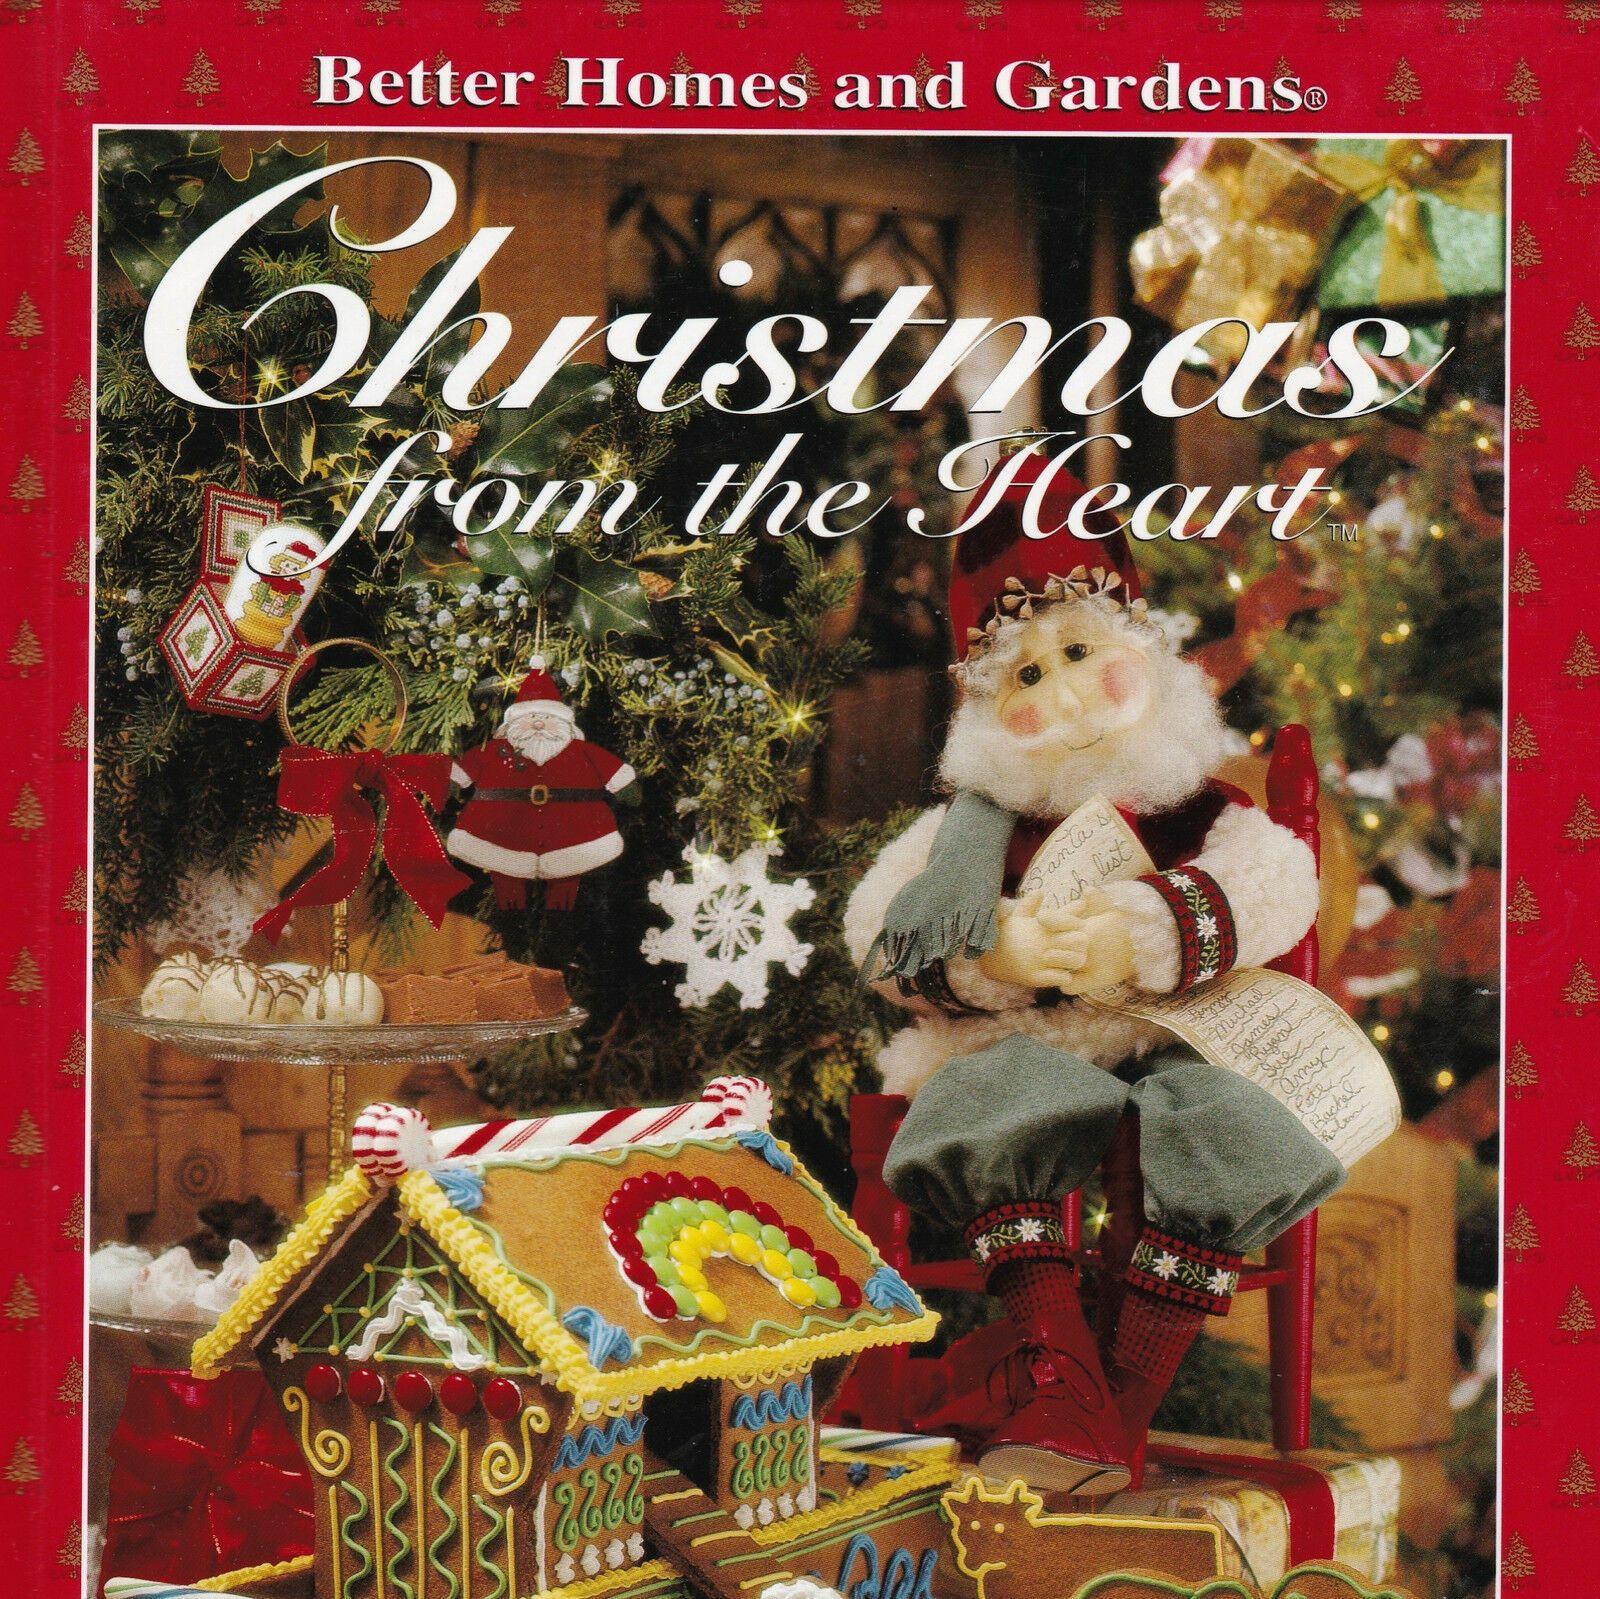 4f50a4cb5ce78a6108d6bdc8148f033e - Better Homes And Gardens Christmas Books